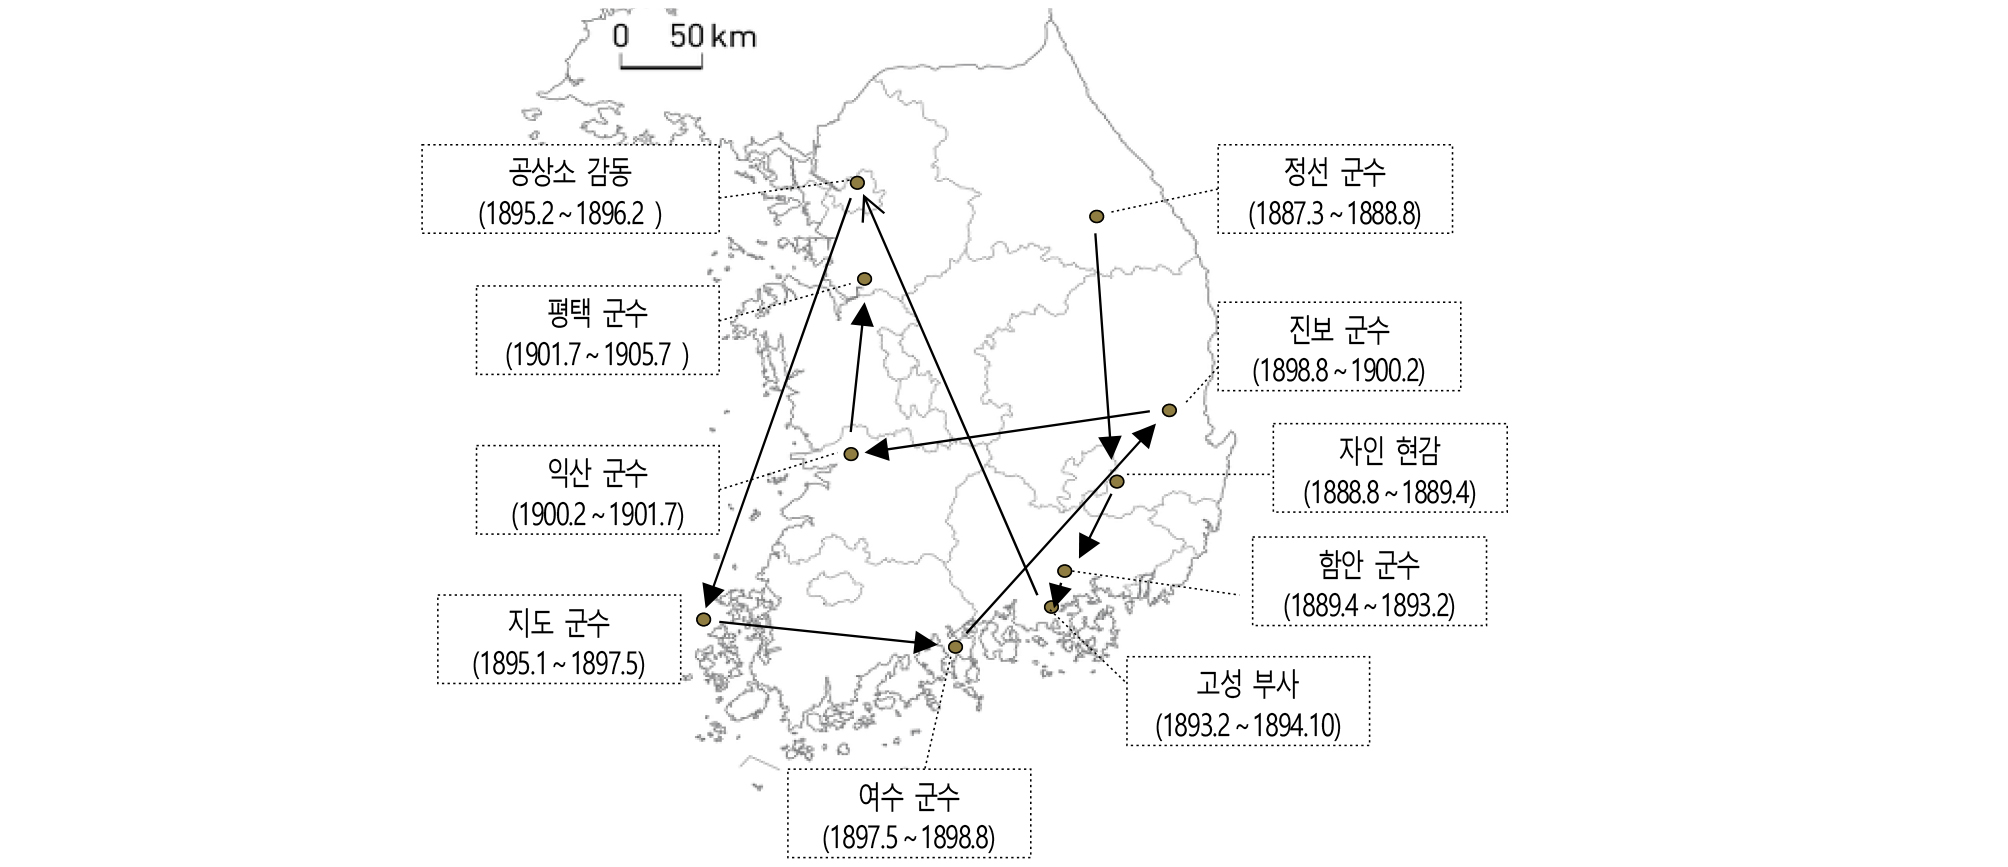 http://static.apub.kr/journalsite/sites/geo/2020-055-02/N013550210/images/geo_55_02_10_F1.jpg